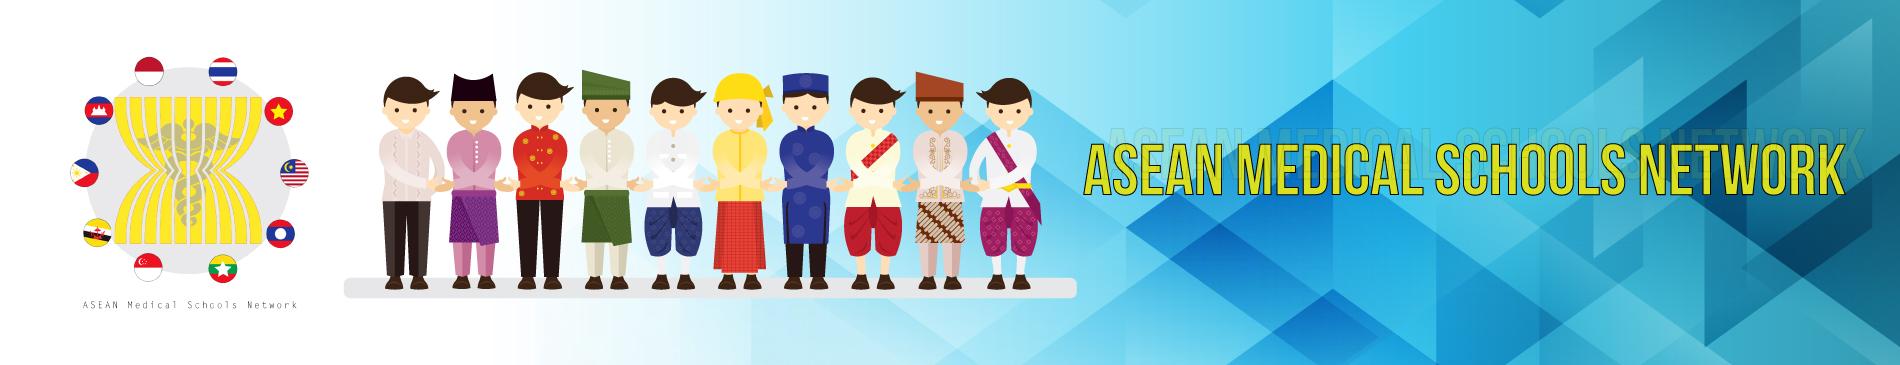 ASEAN Medical Schools Network